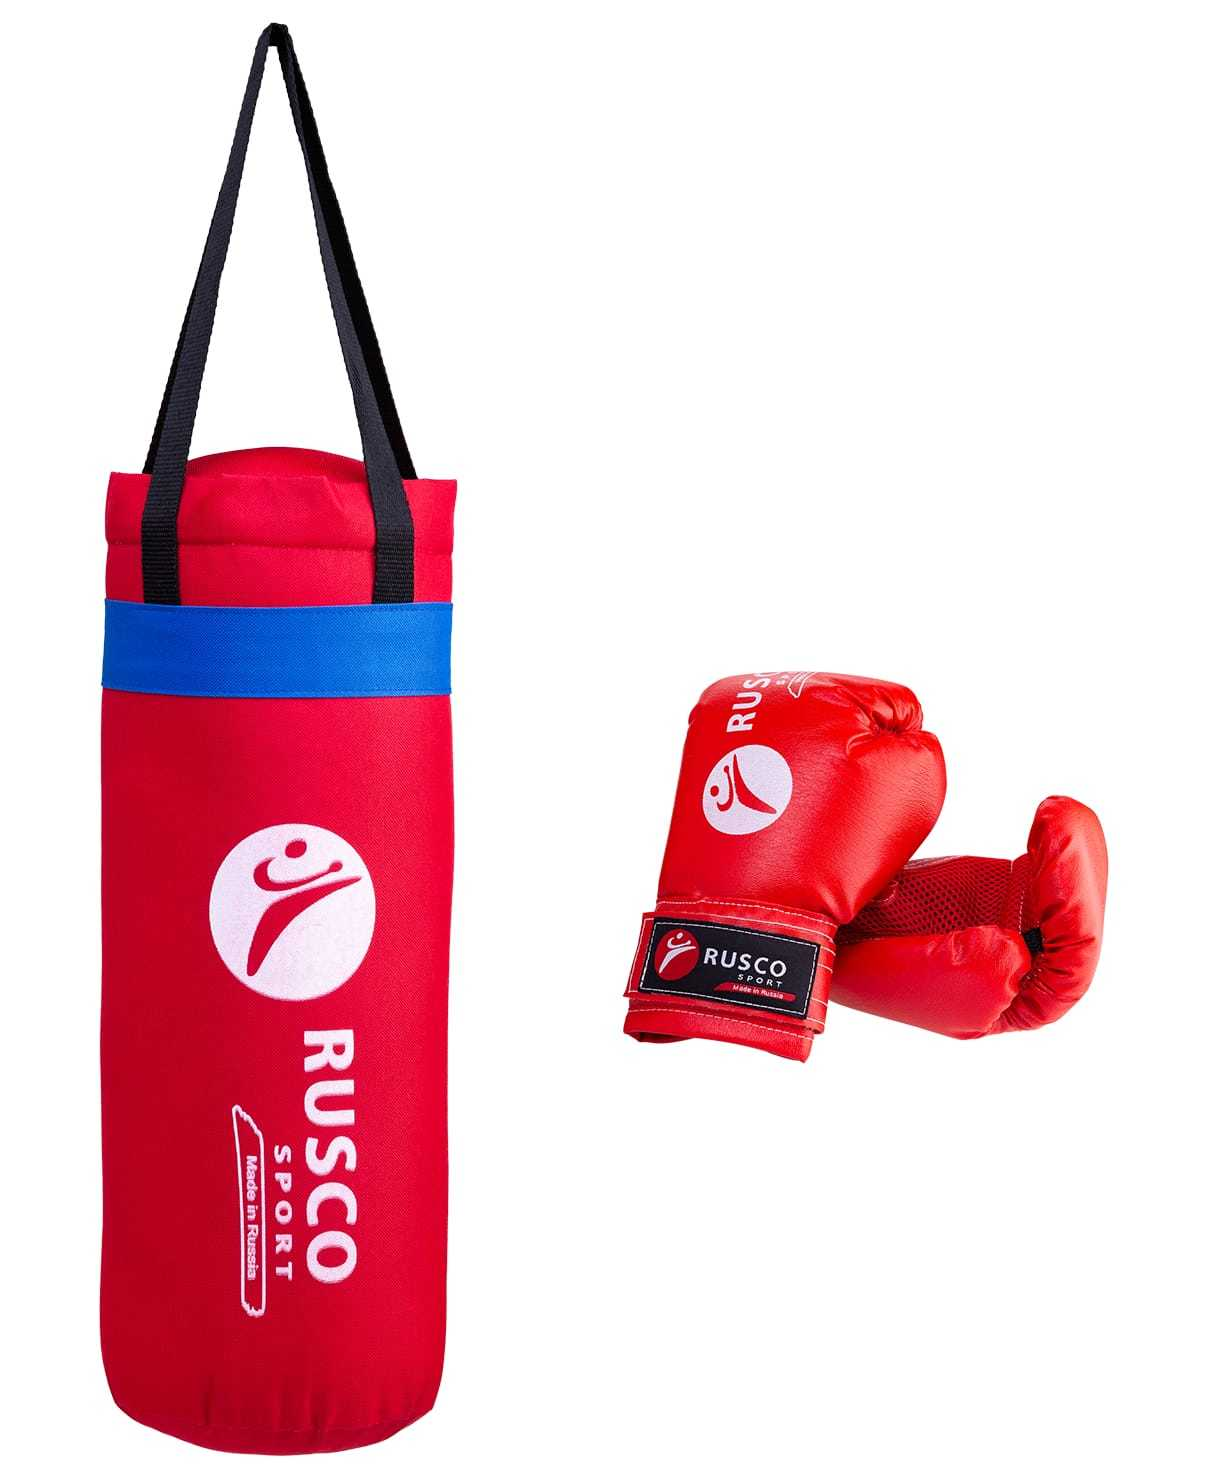 Снаряды Набор для бокса Rusco, 4oz, кожзам, красный e241bccb93324829aeb907202699ba7f.jpg